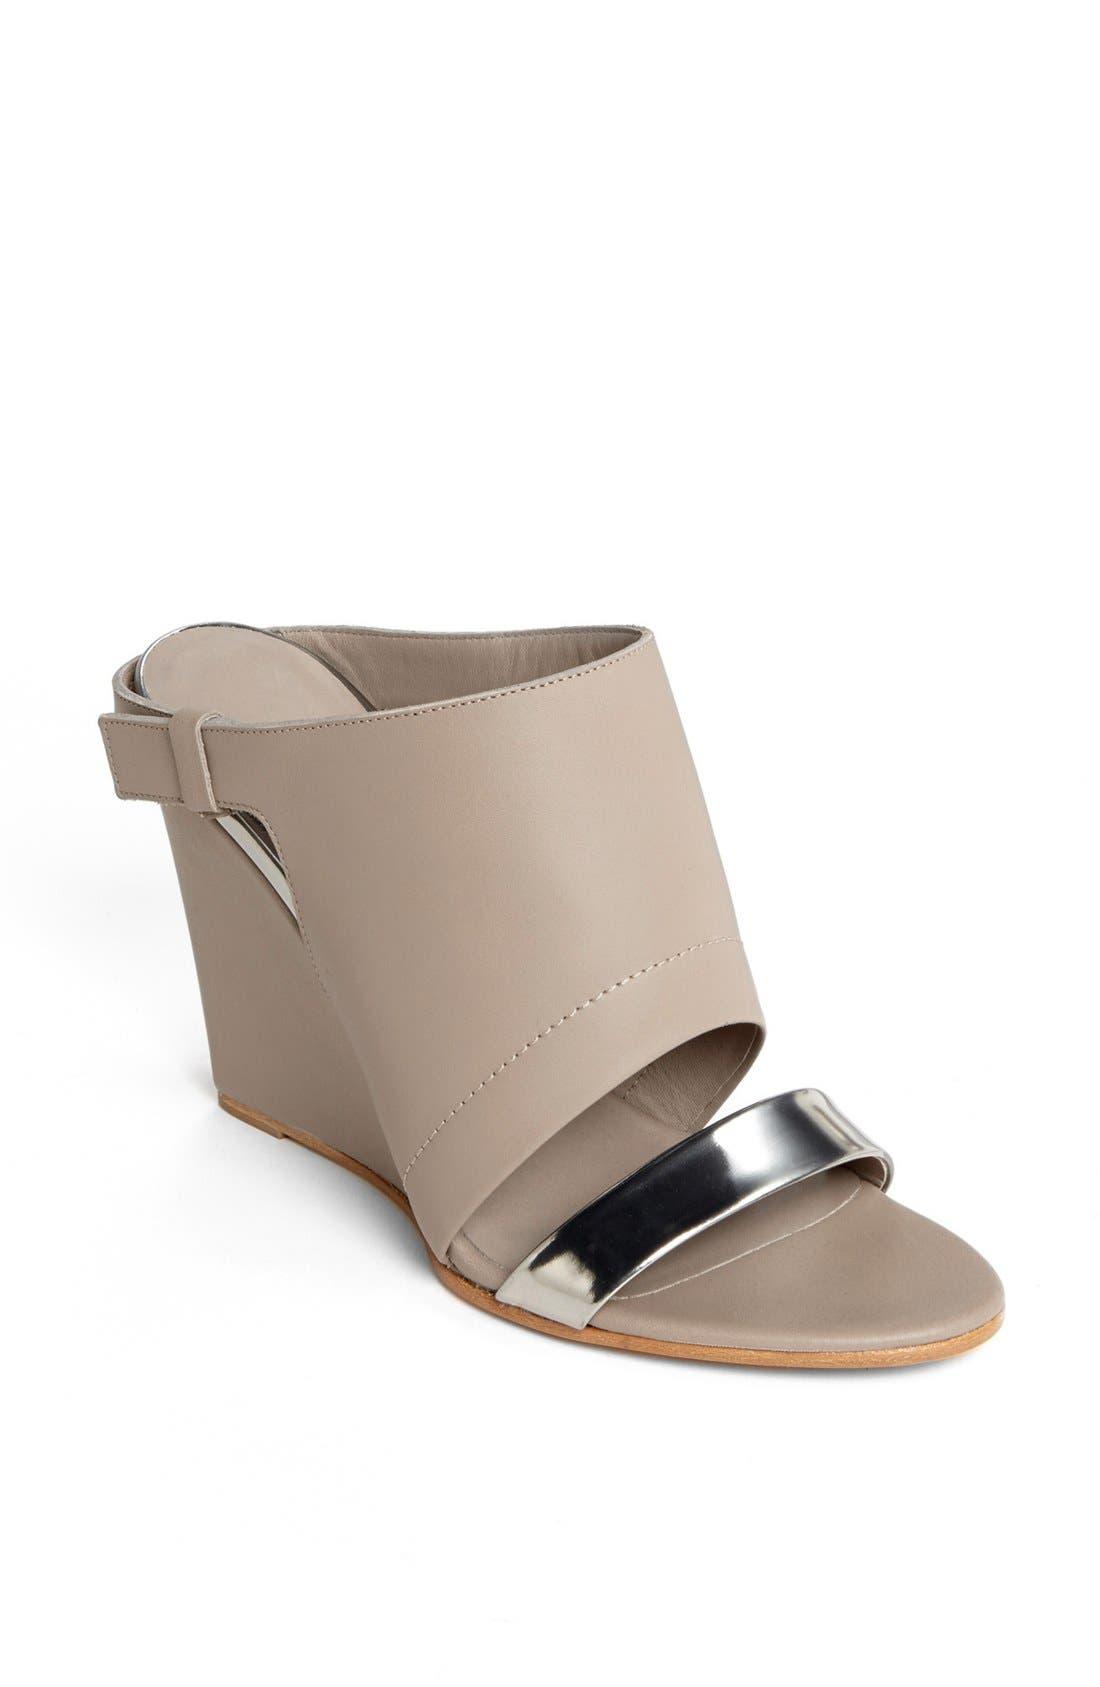 Main Image - Vince 'Kasia' Wedge Sandal